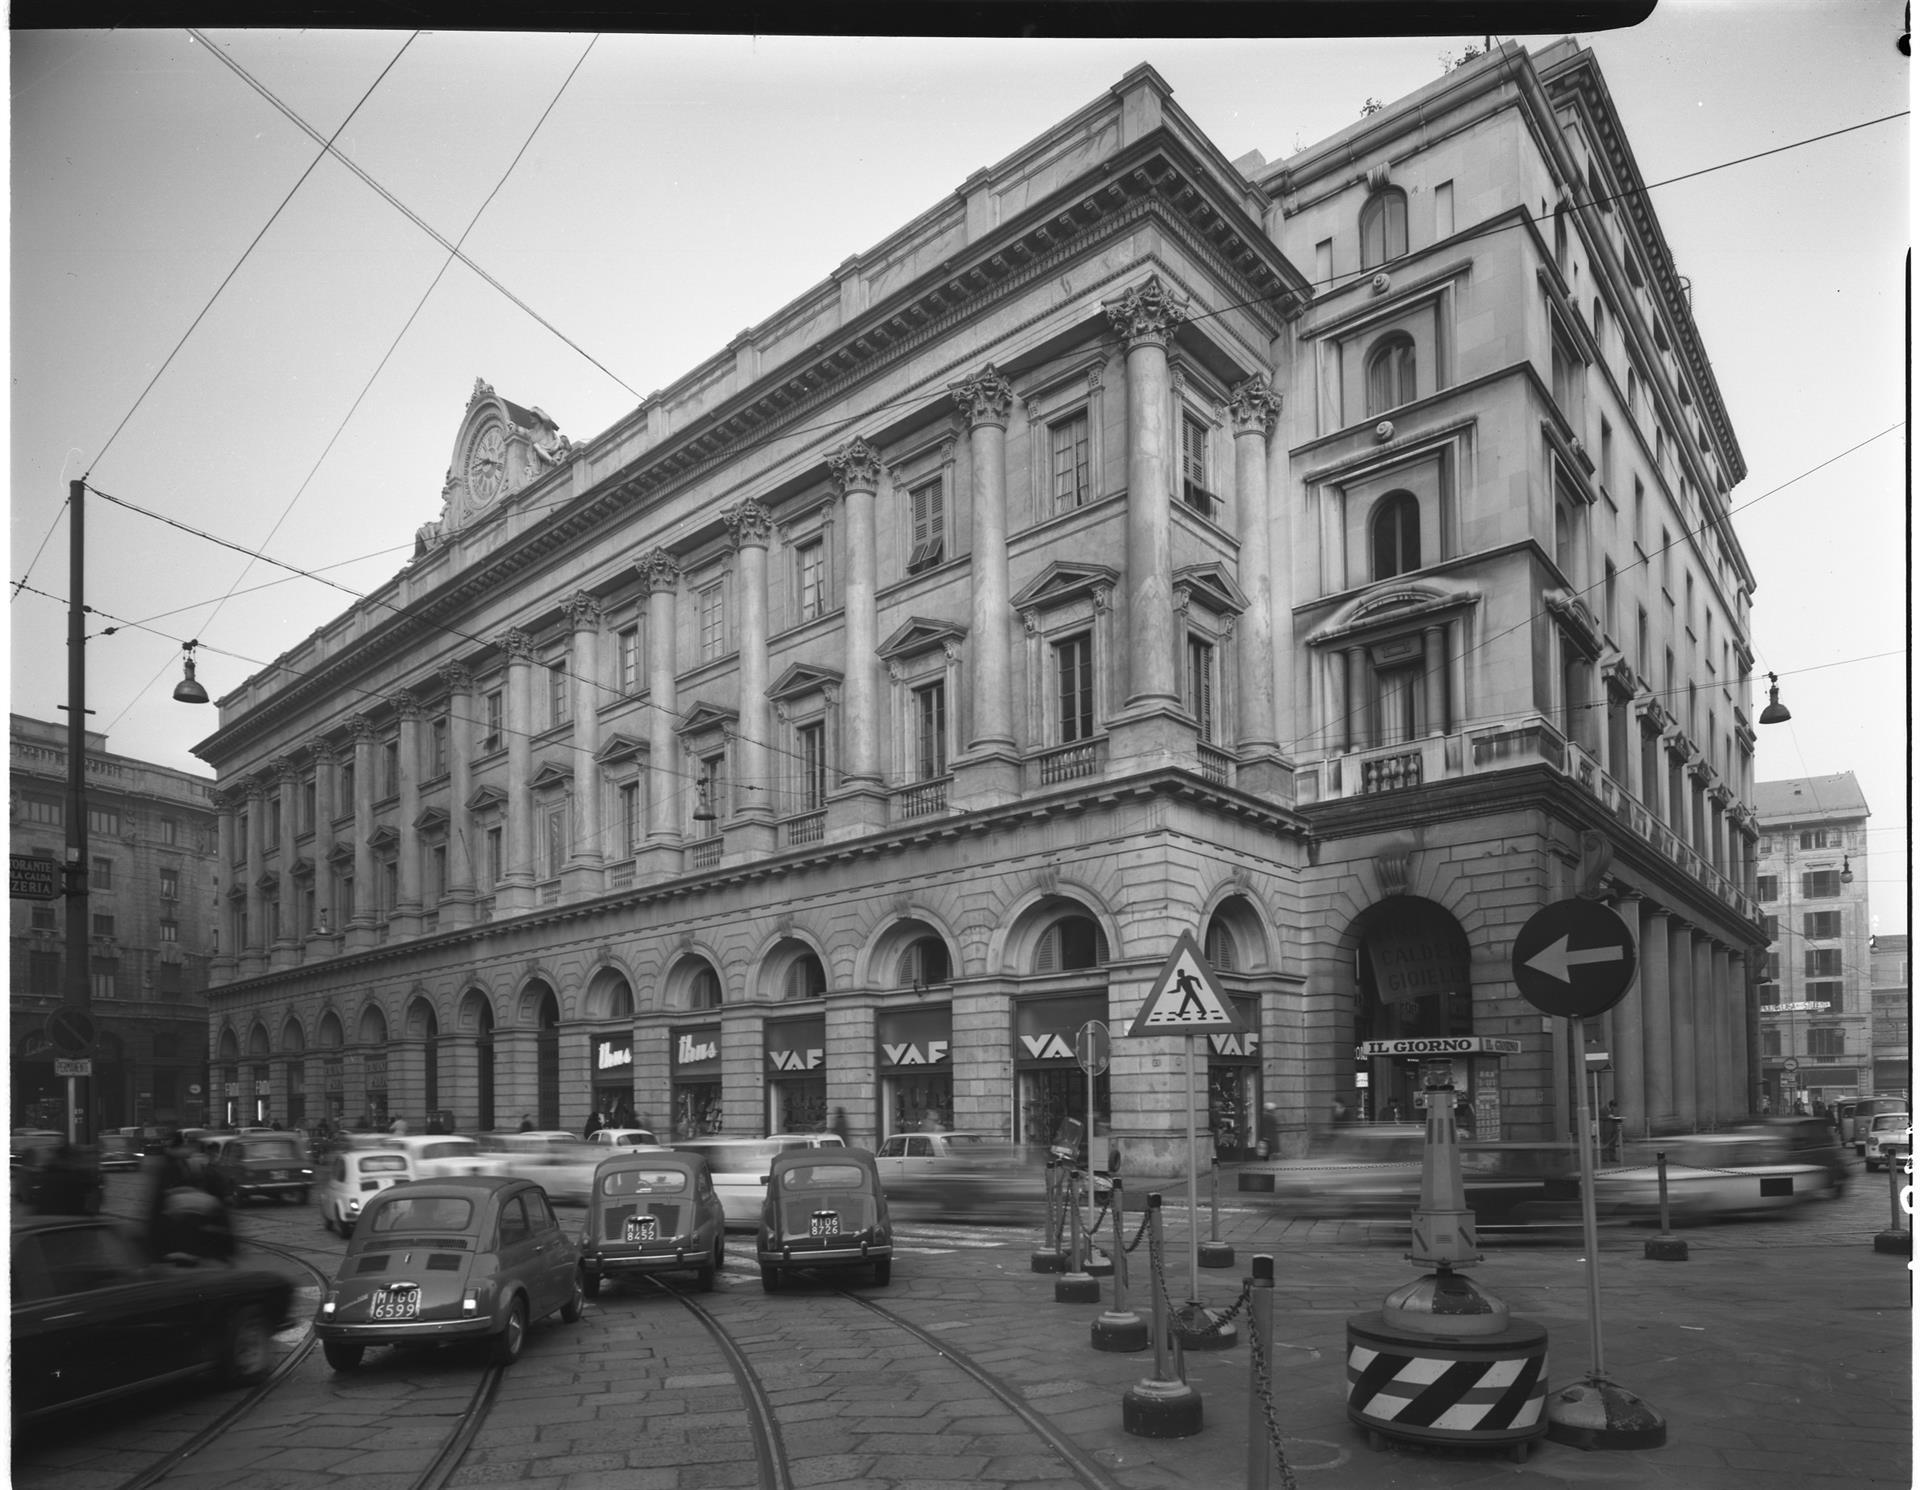 Palazzo VFD